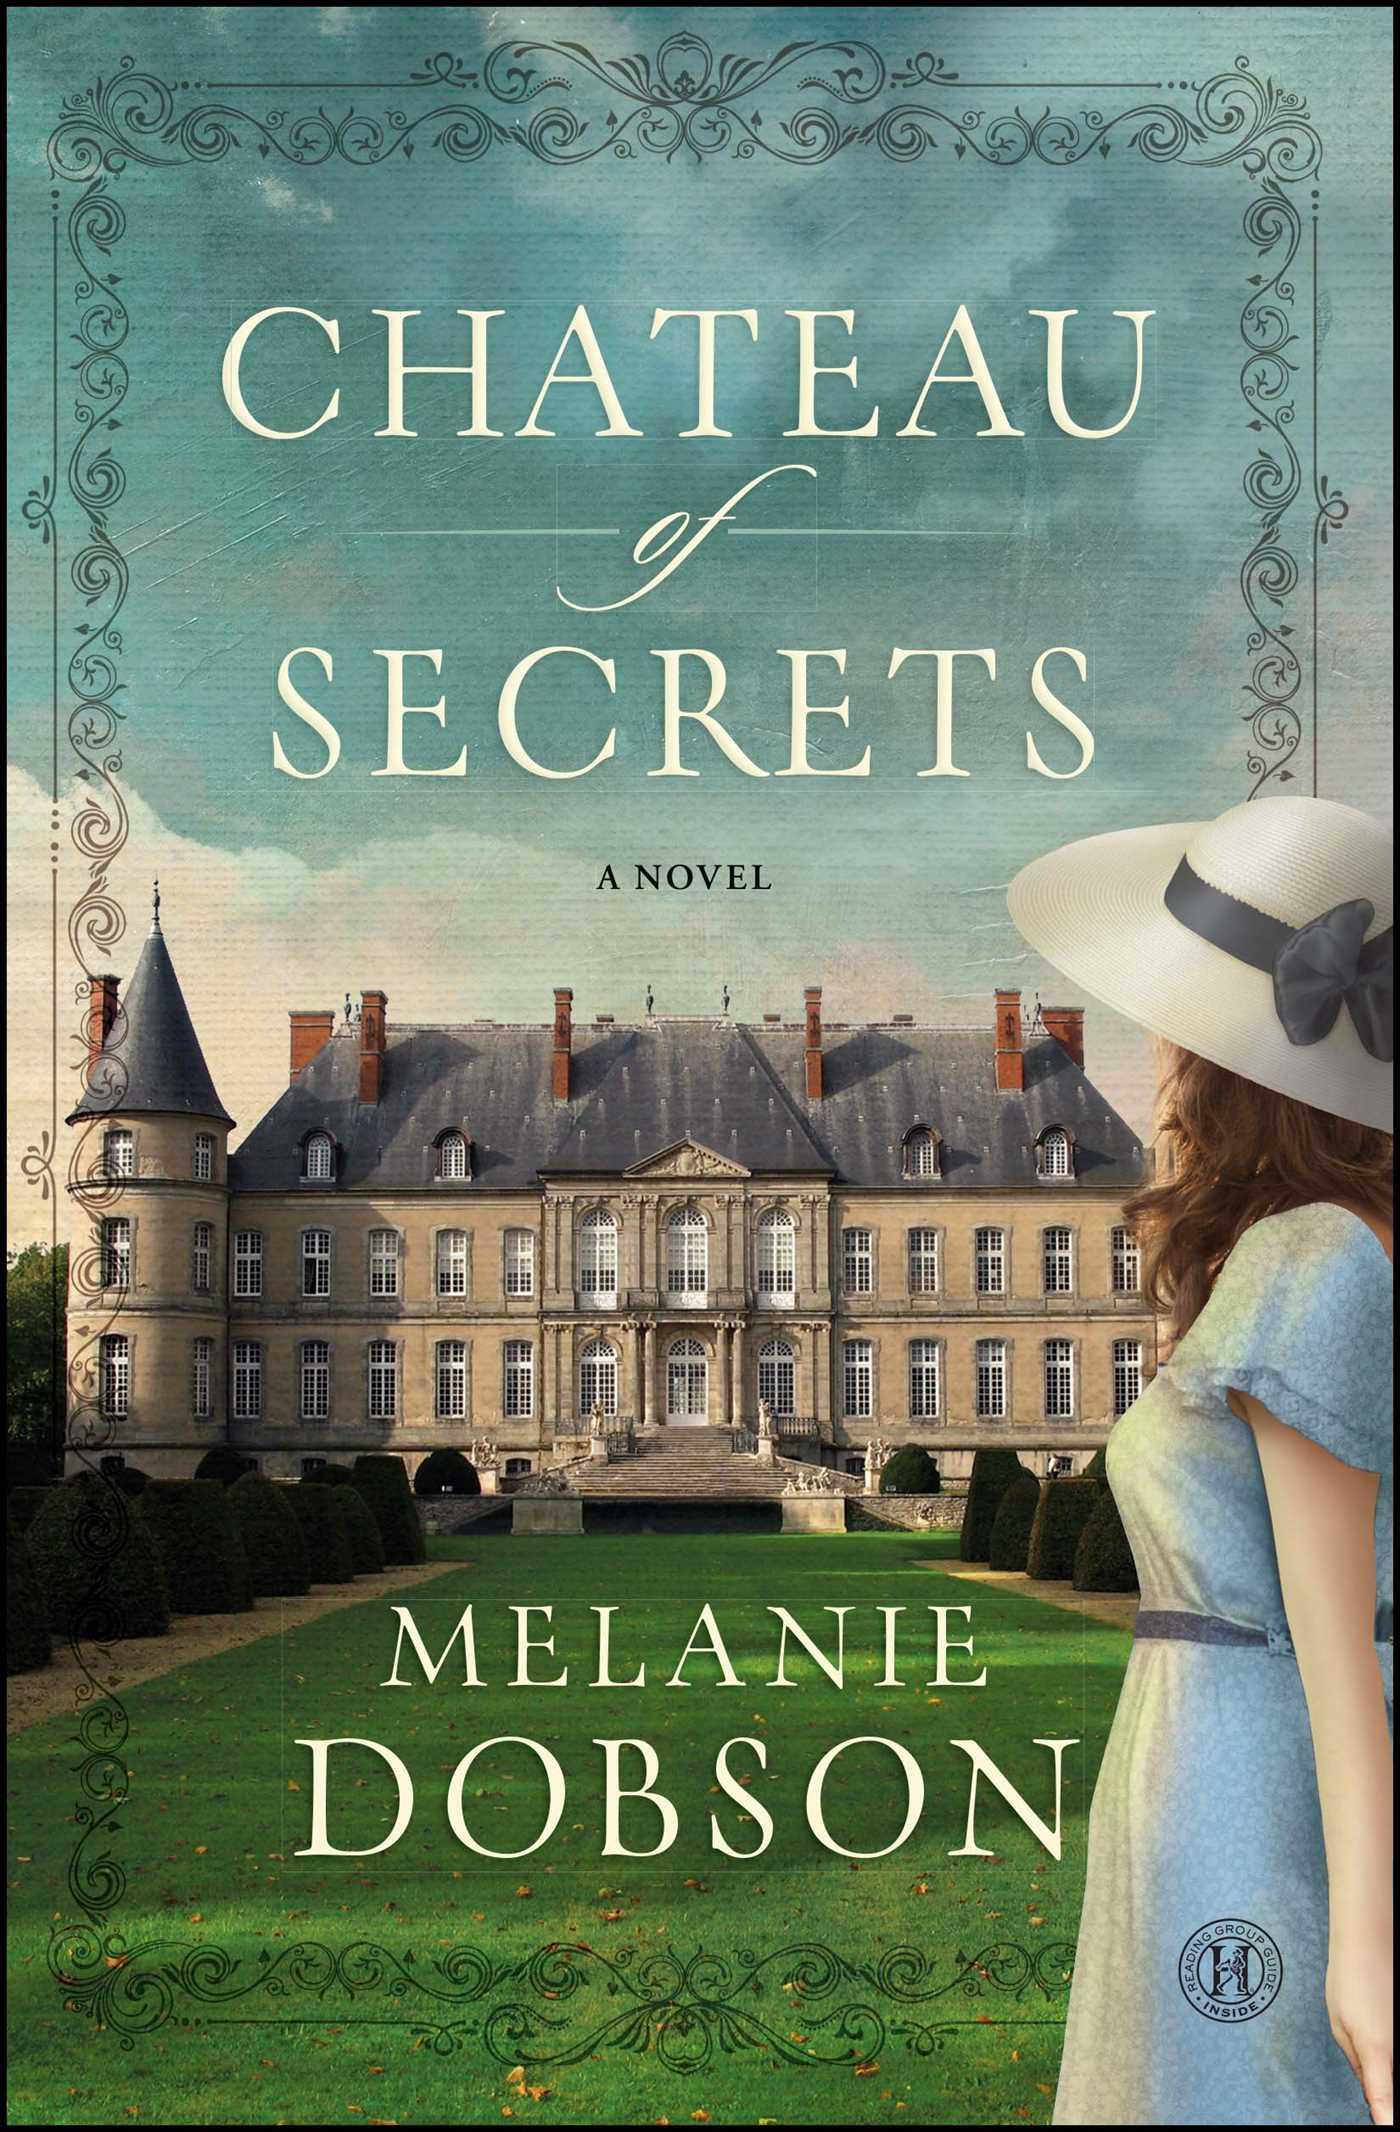 Chateau of secrets 9781476746111 hr